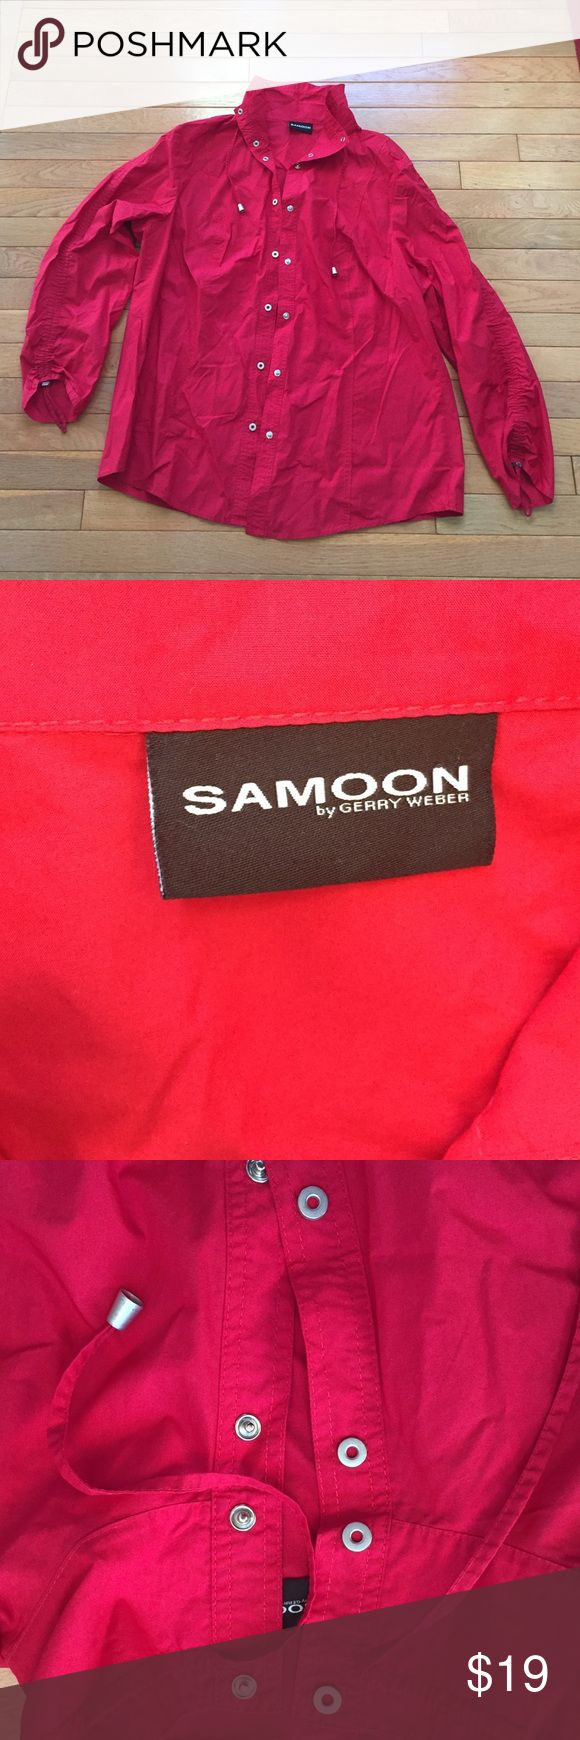 Samoon by Gerry Weber red windbreaker women's M Samoon by Gerry Weber red windbreaker women's small Medium, 100% cotton SAMOON Tops